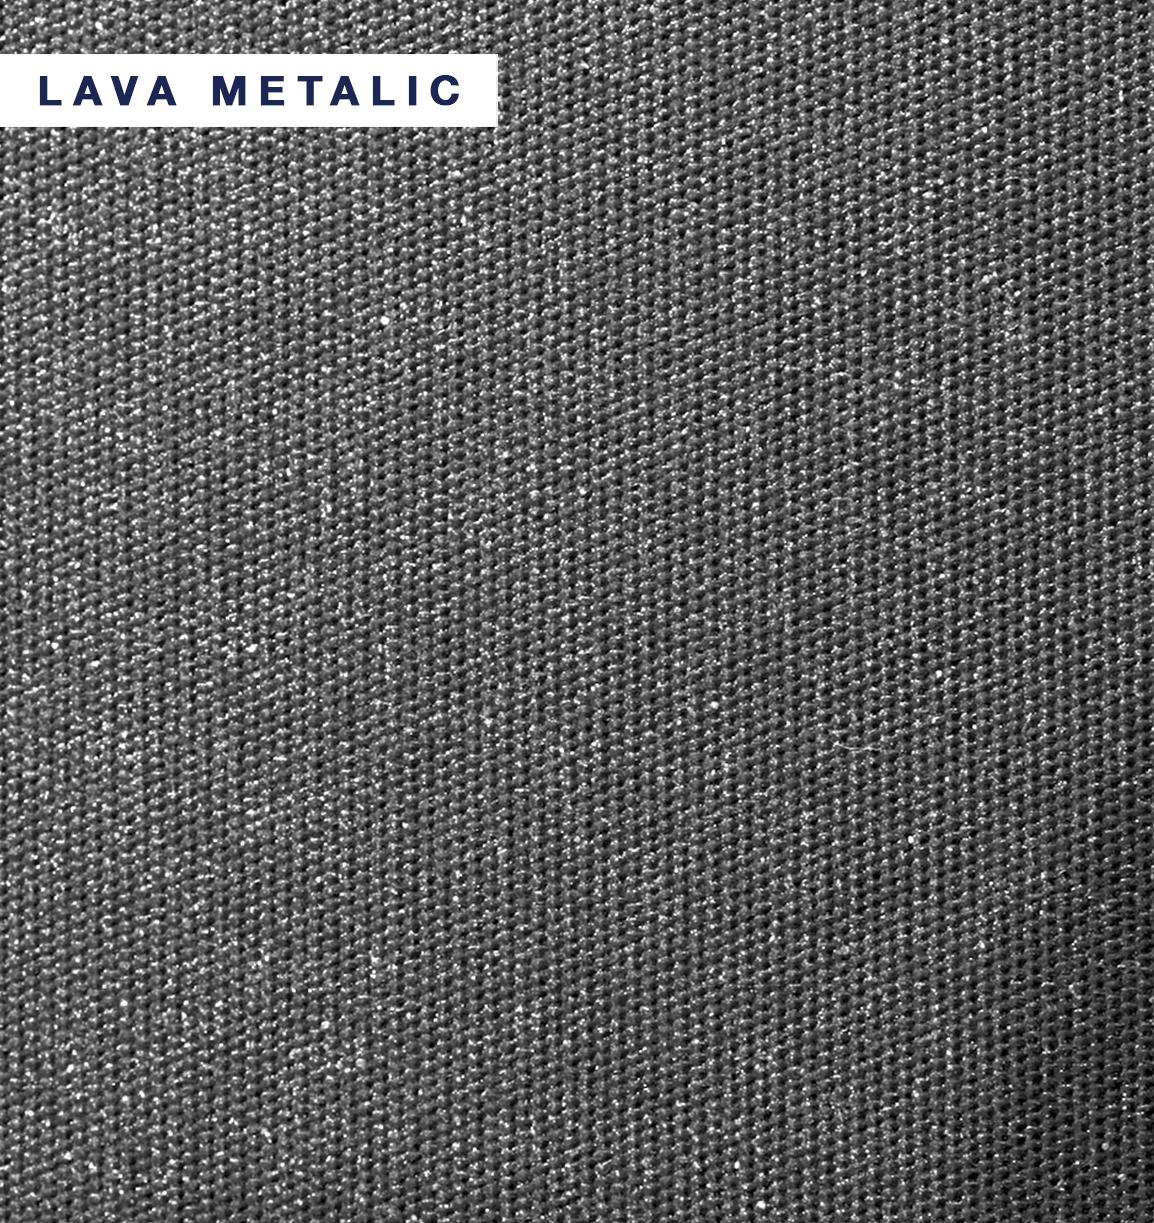 VIBE - Lava Metallic.jpg